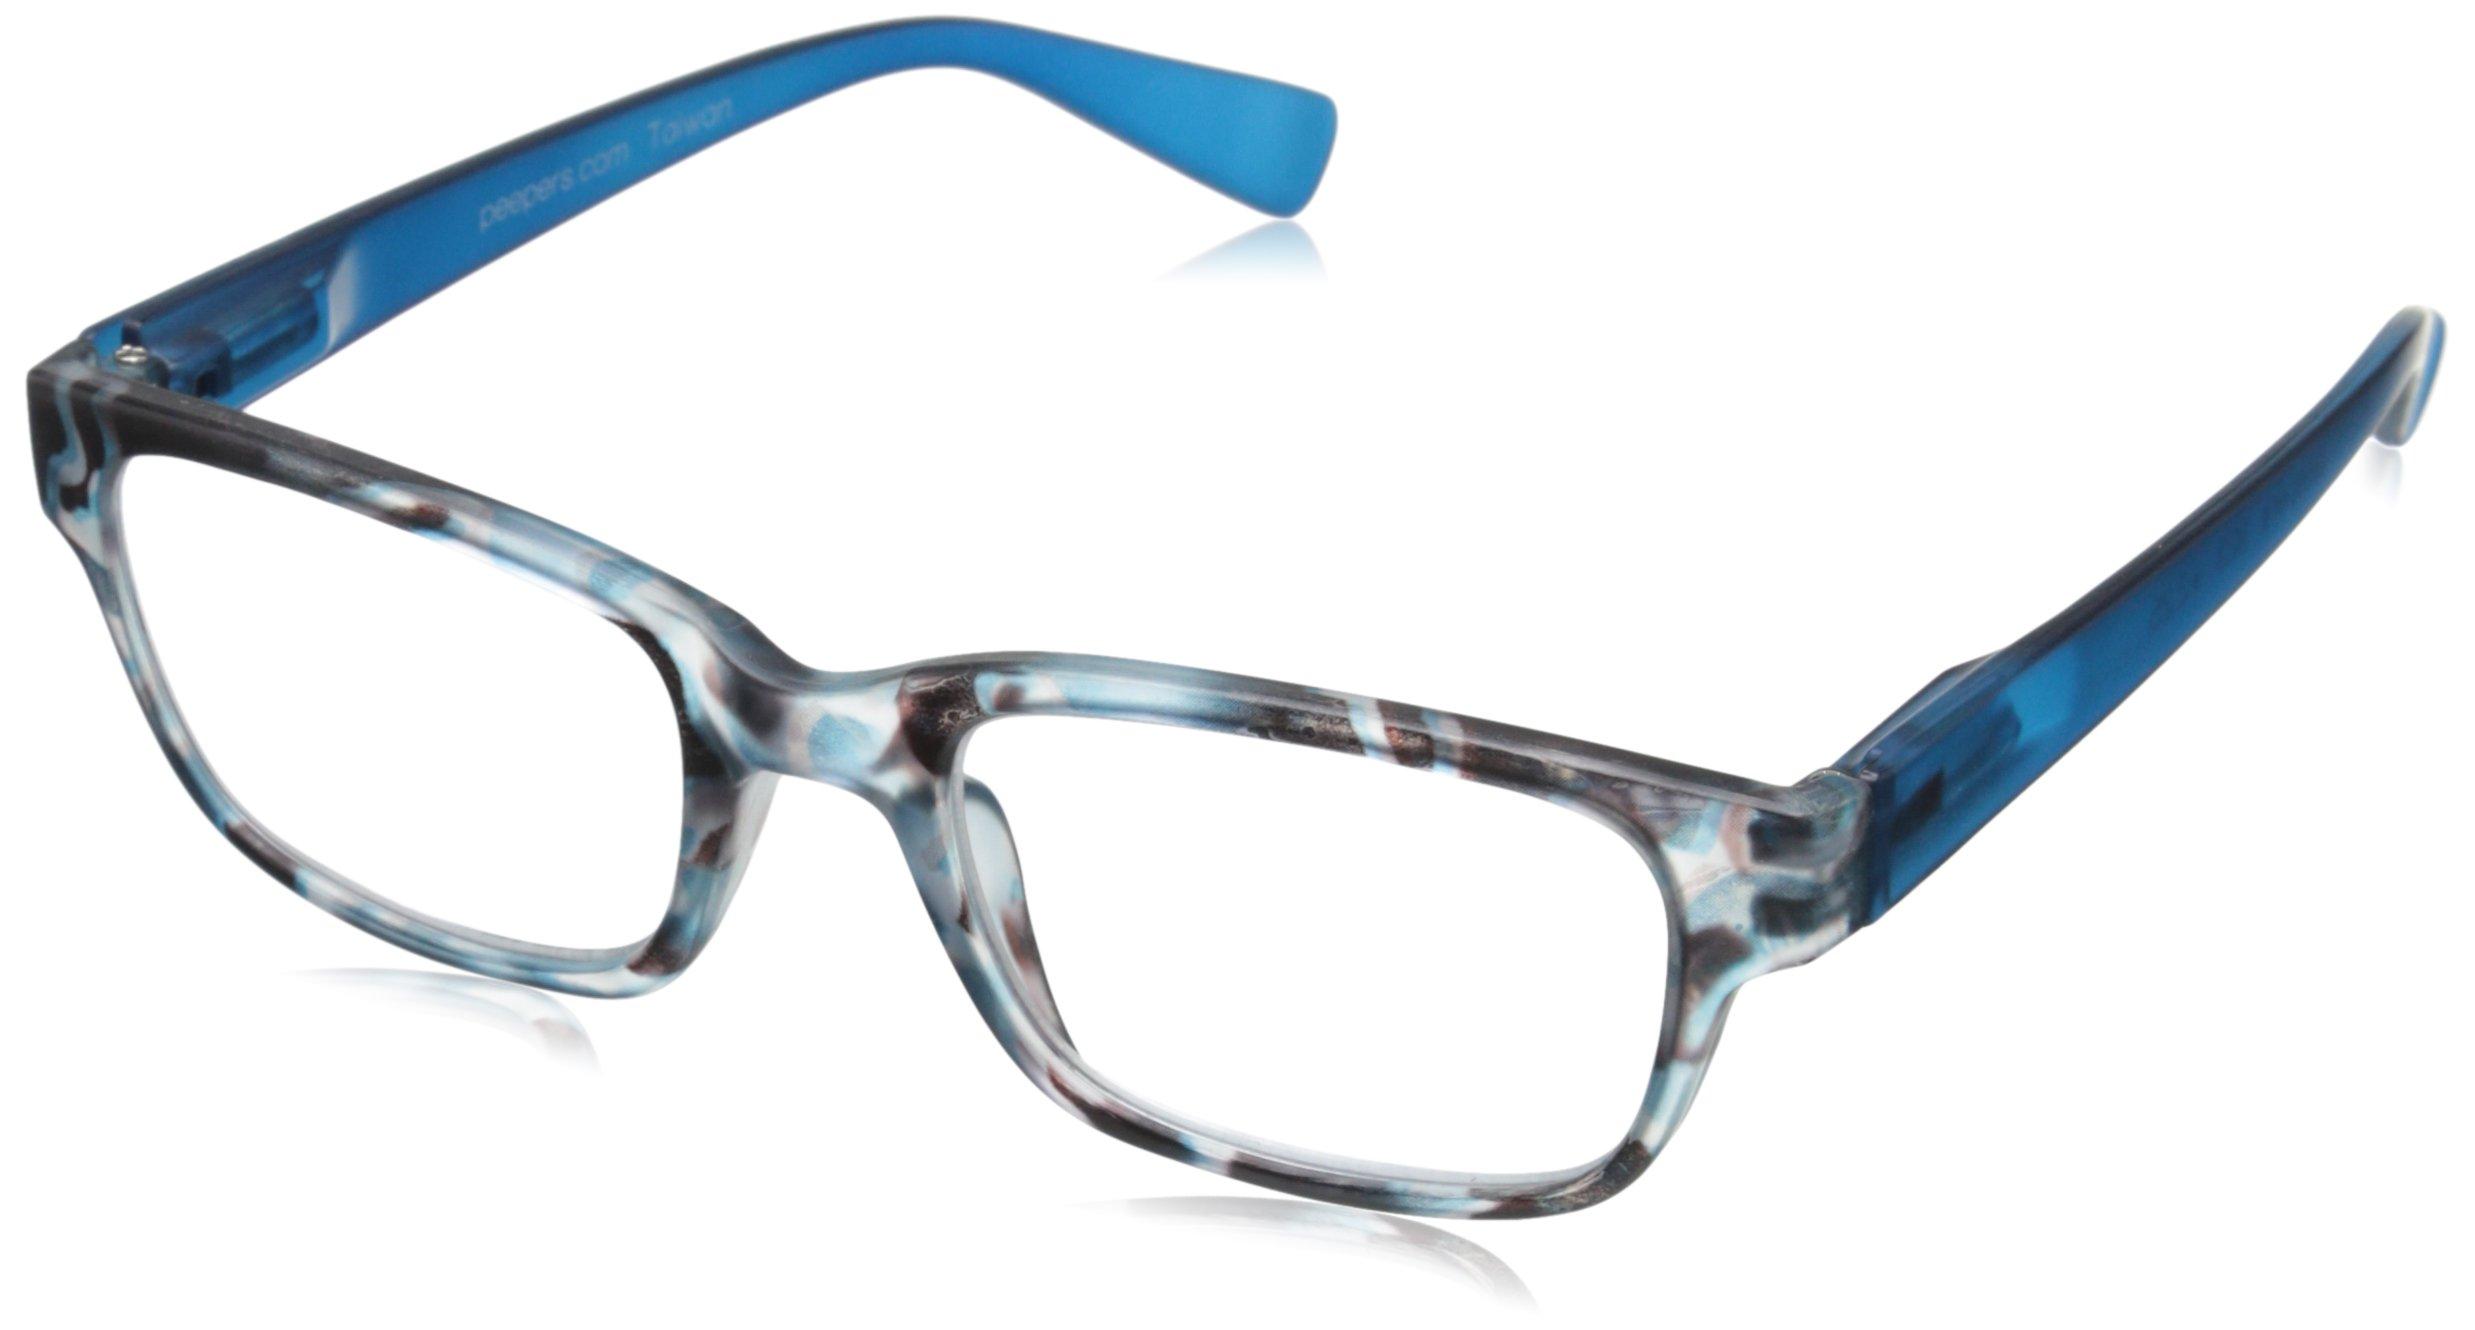 Peepers Flip The Script Square Reading Glasses, Blue Tortoise, 2.5